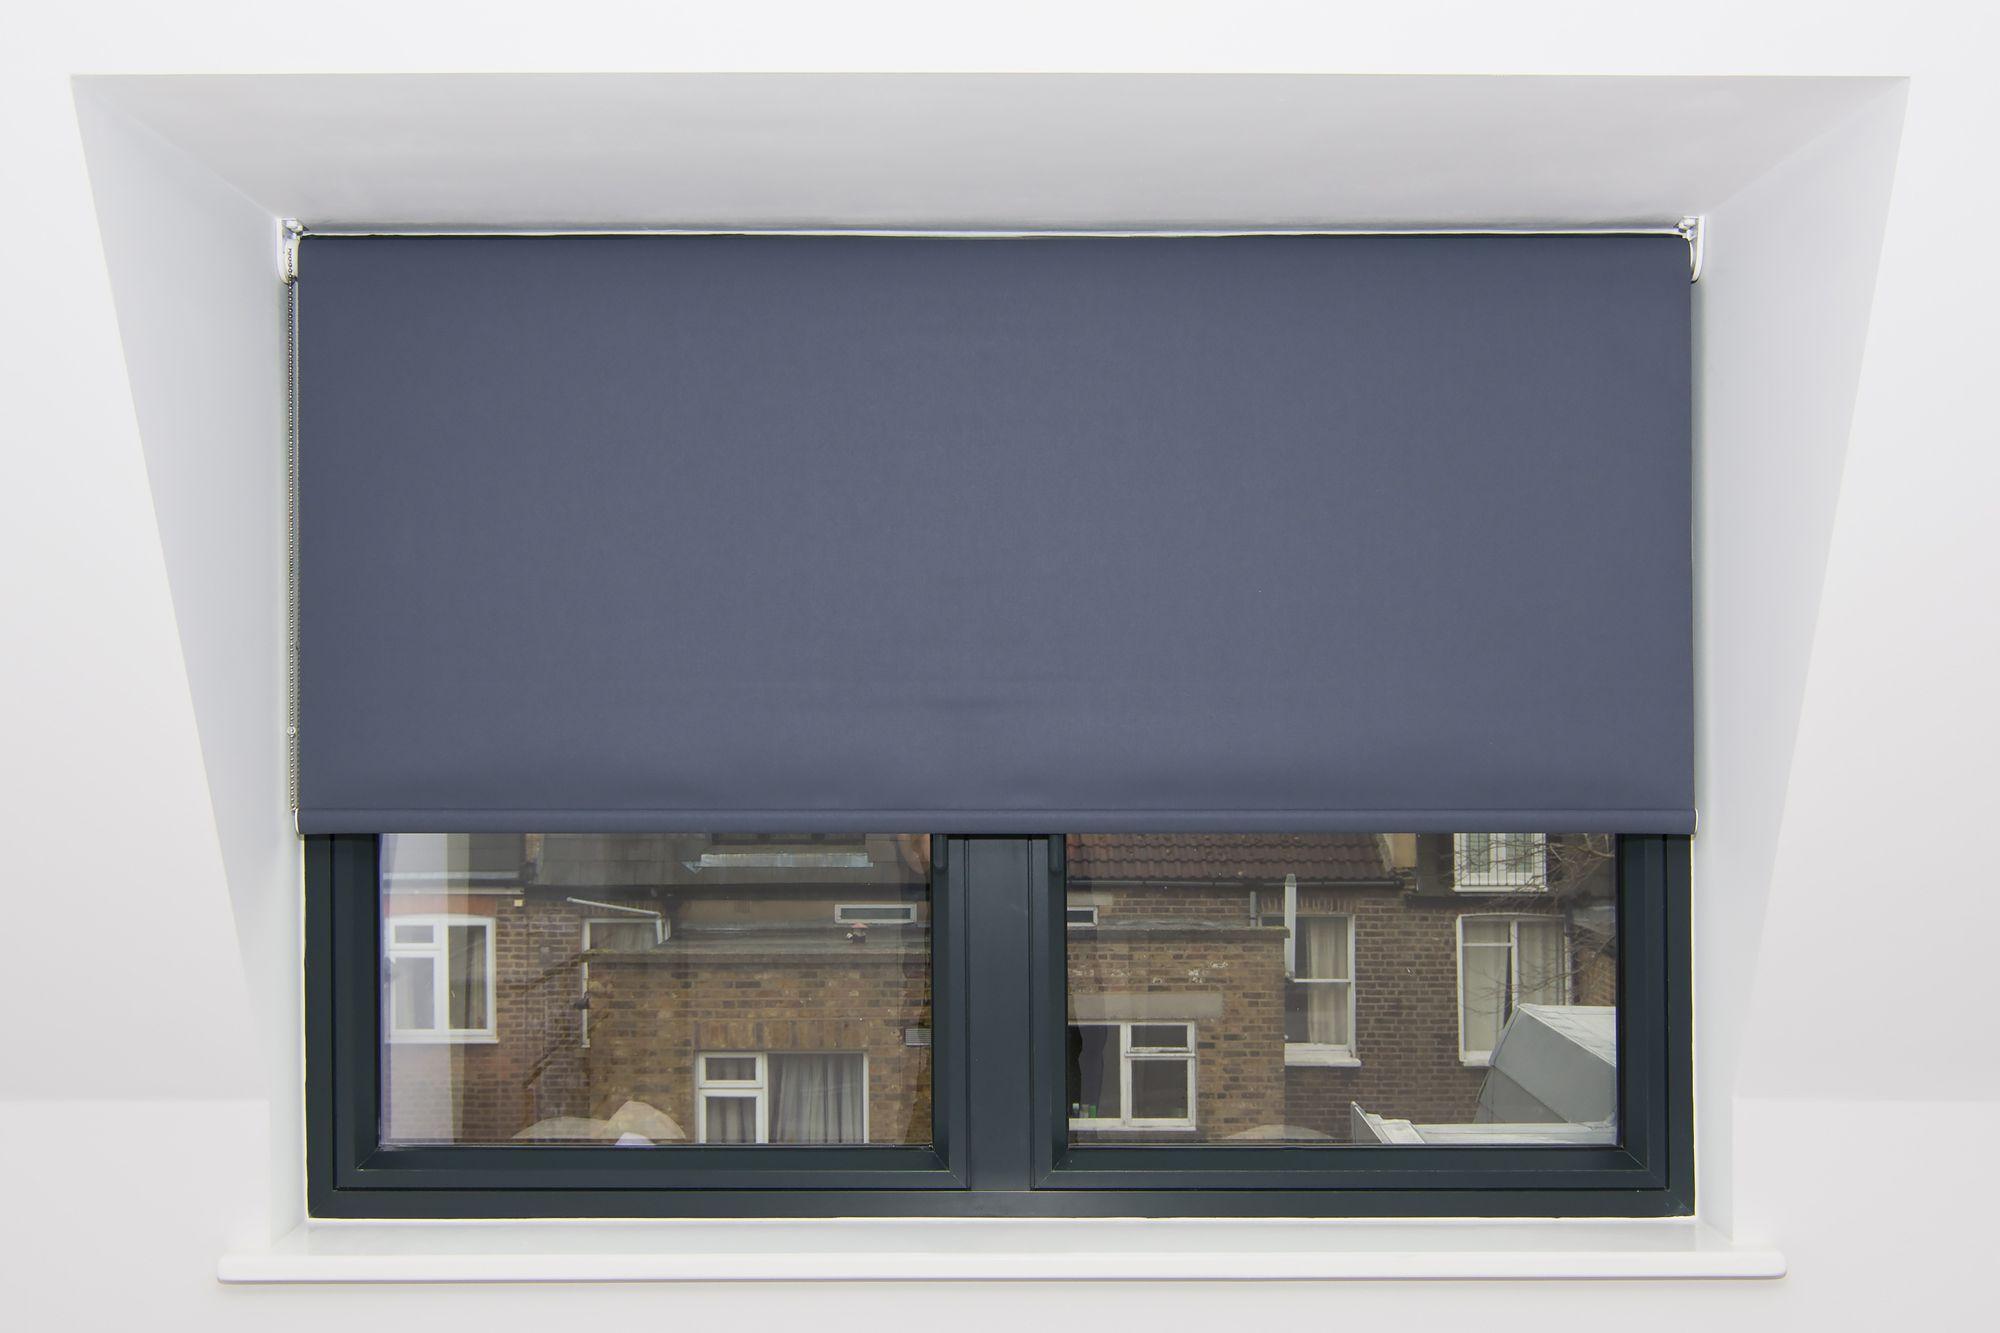 Blackout Bedroom Blinds Inspiration Blackout Roller Blind Installed Reverse Roll To Avoid Window Inspiration